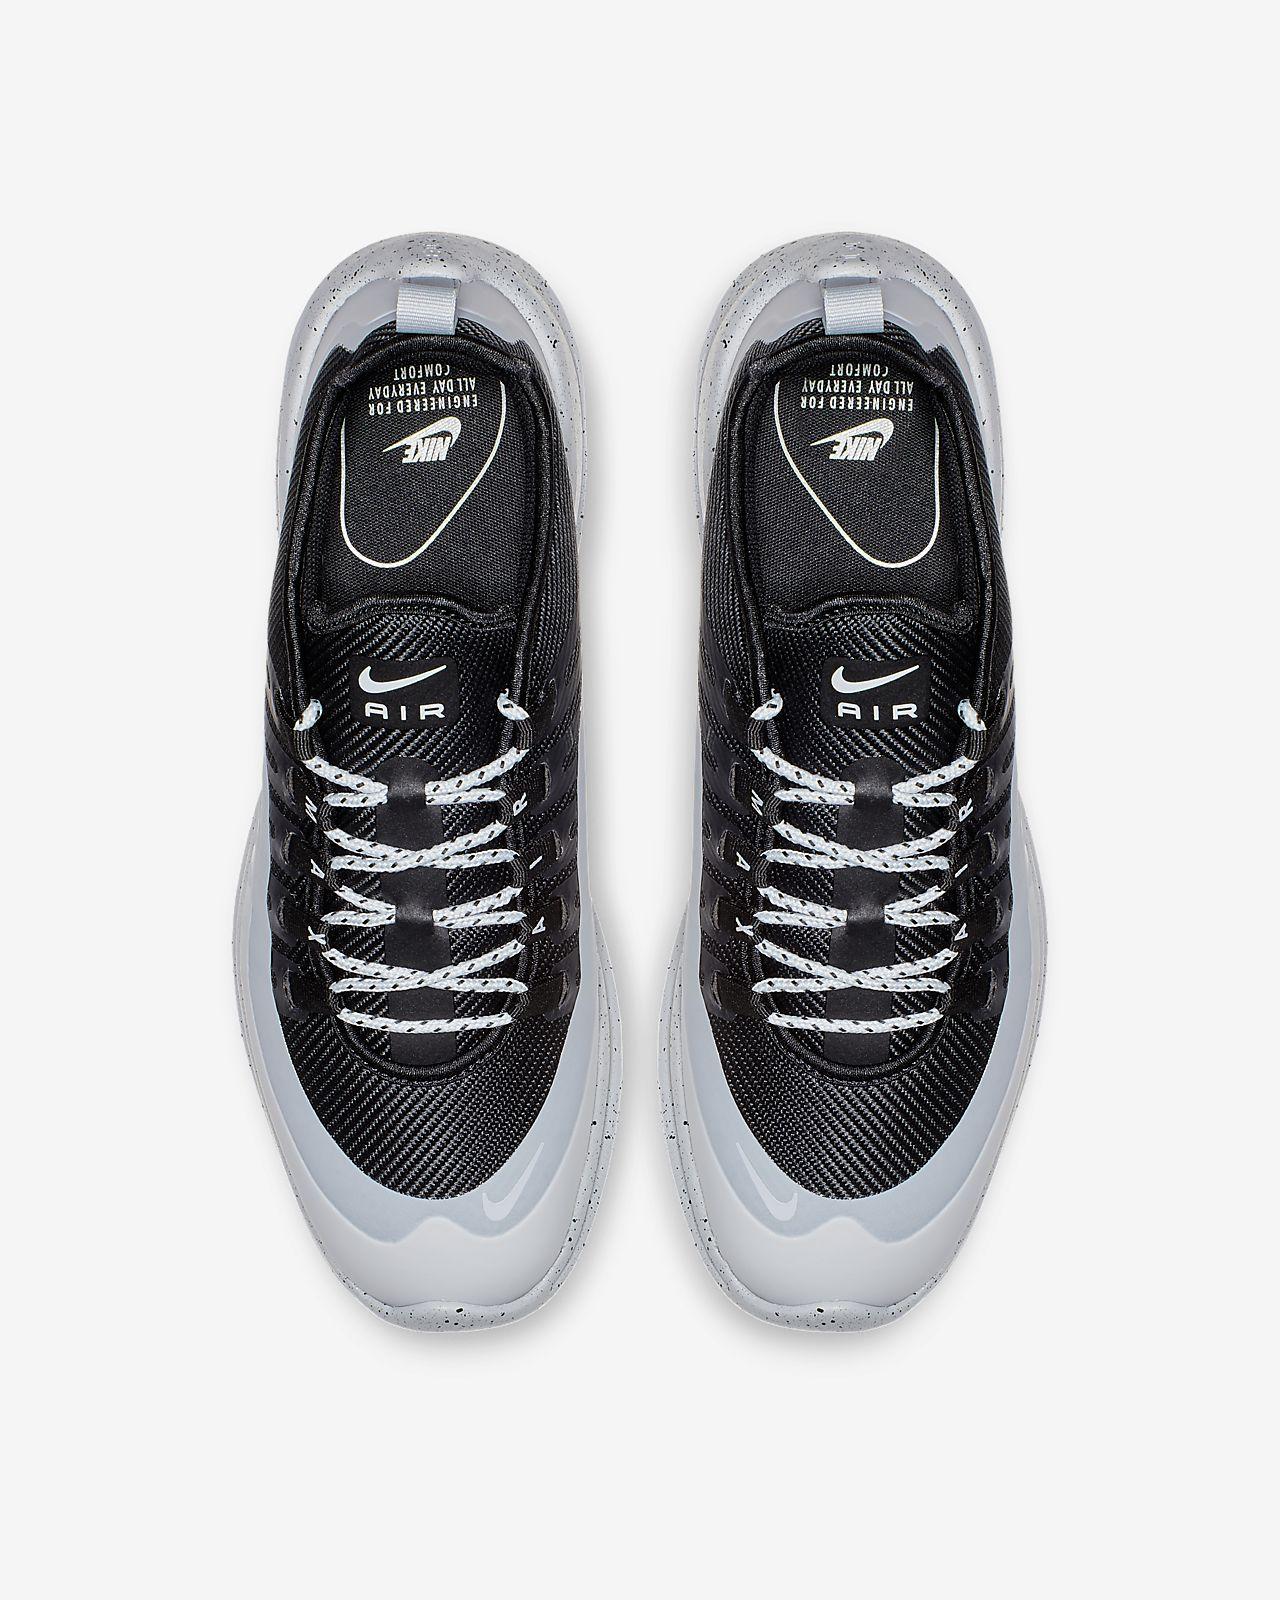 Nike Air Max Axis Premium Herenschoen. Nike NL